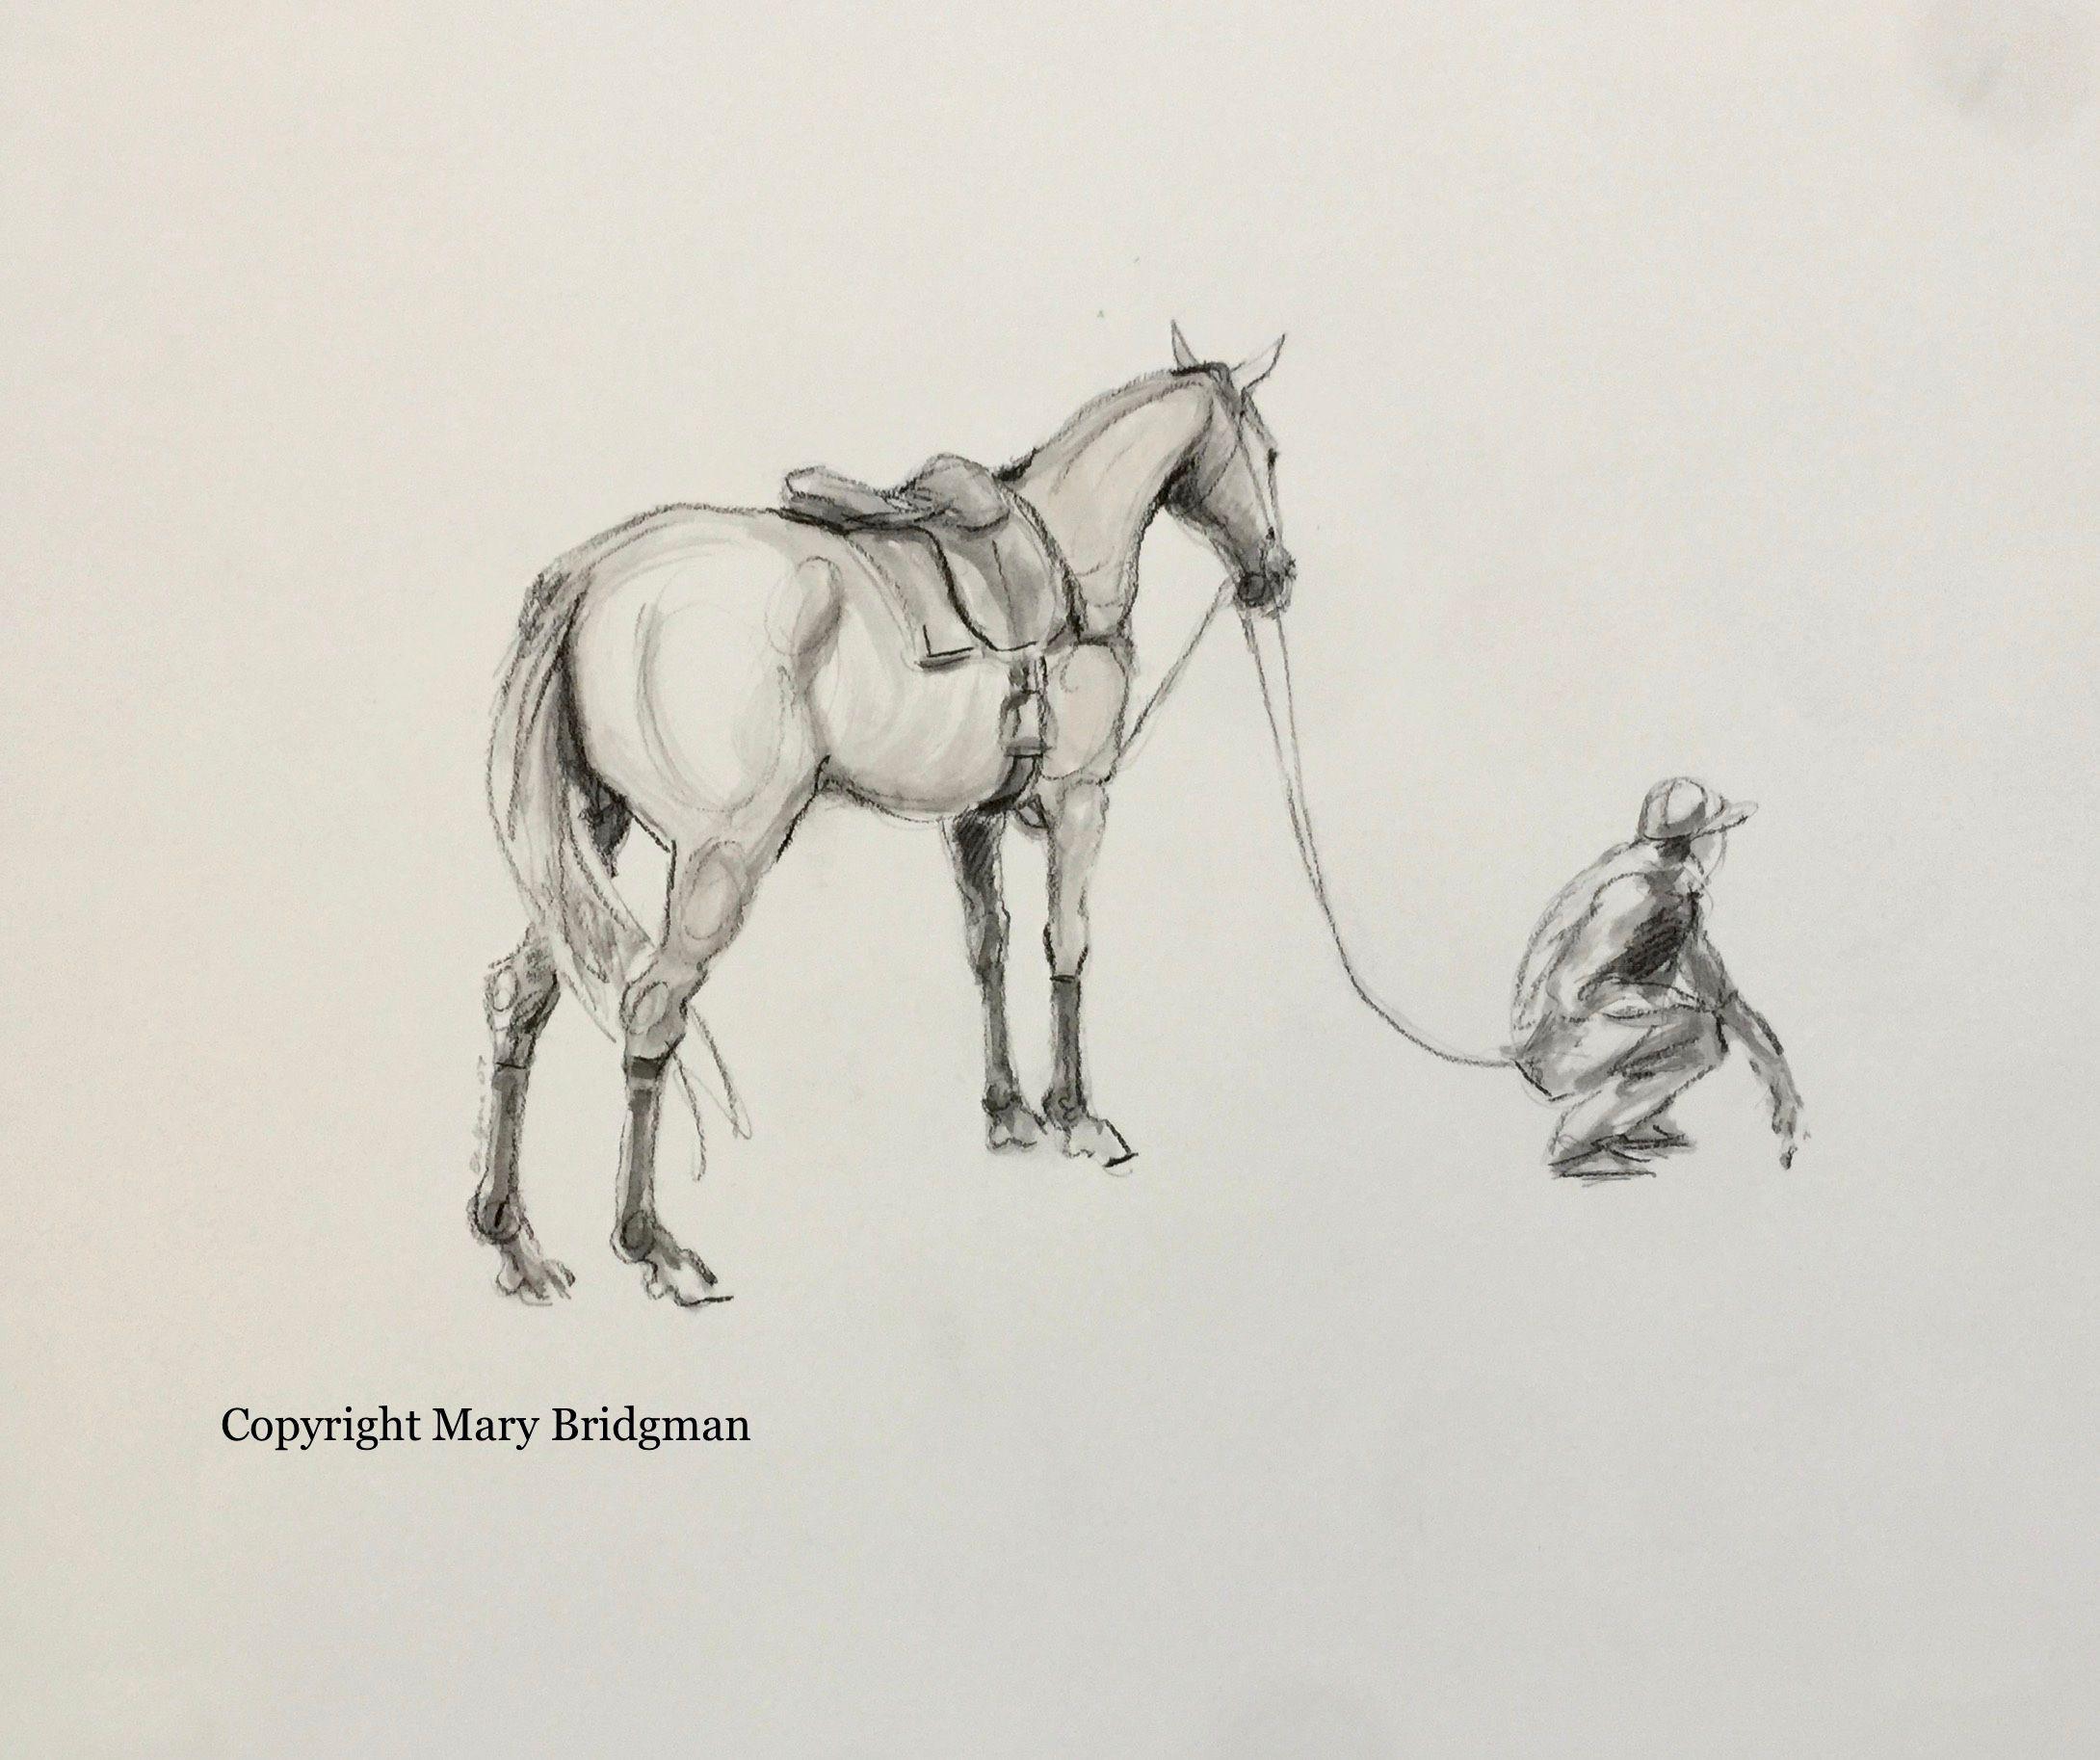 Polo Pony With a Groom